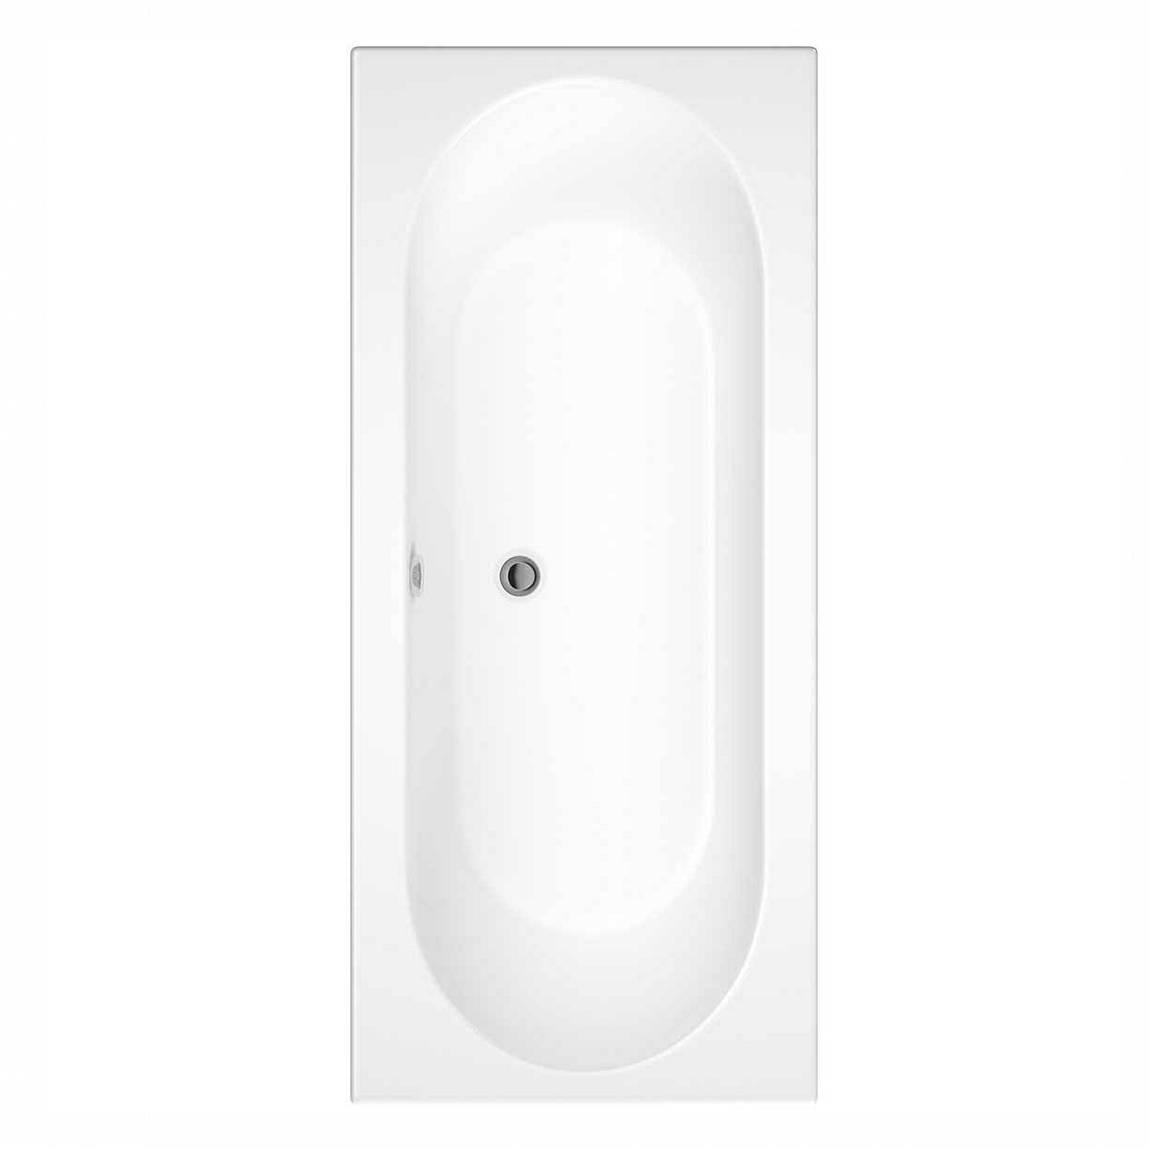 Image of Islington Bath 1800 x 800